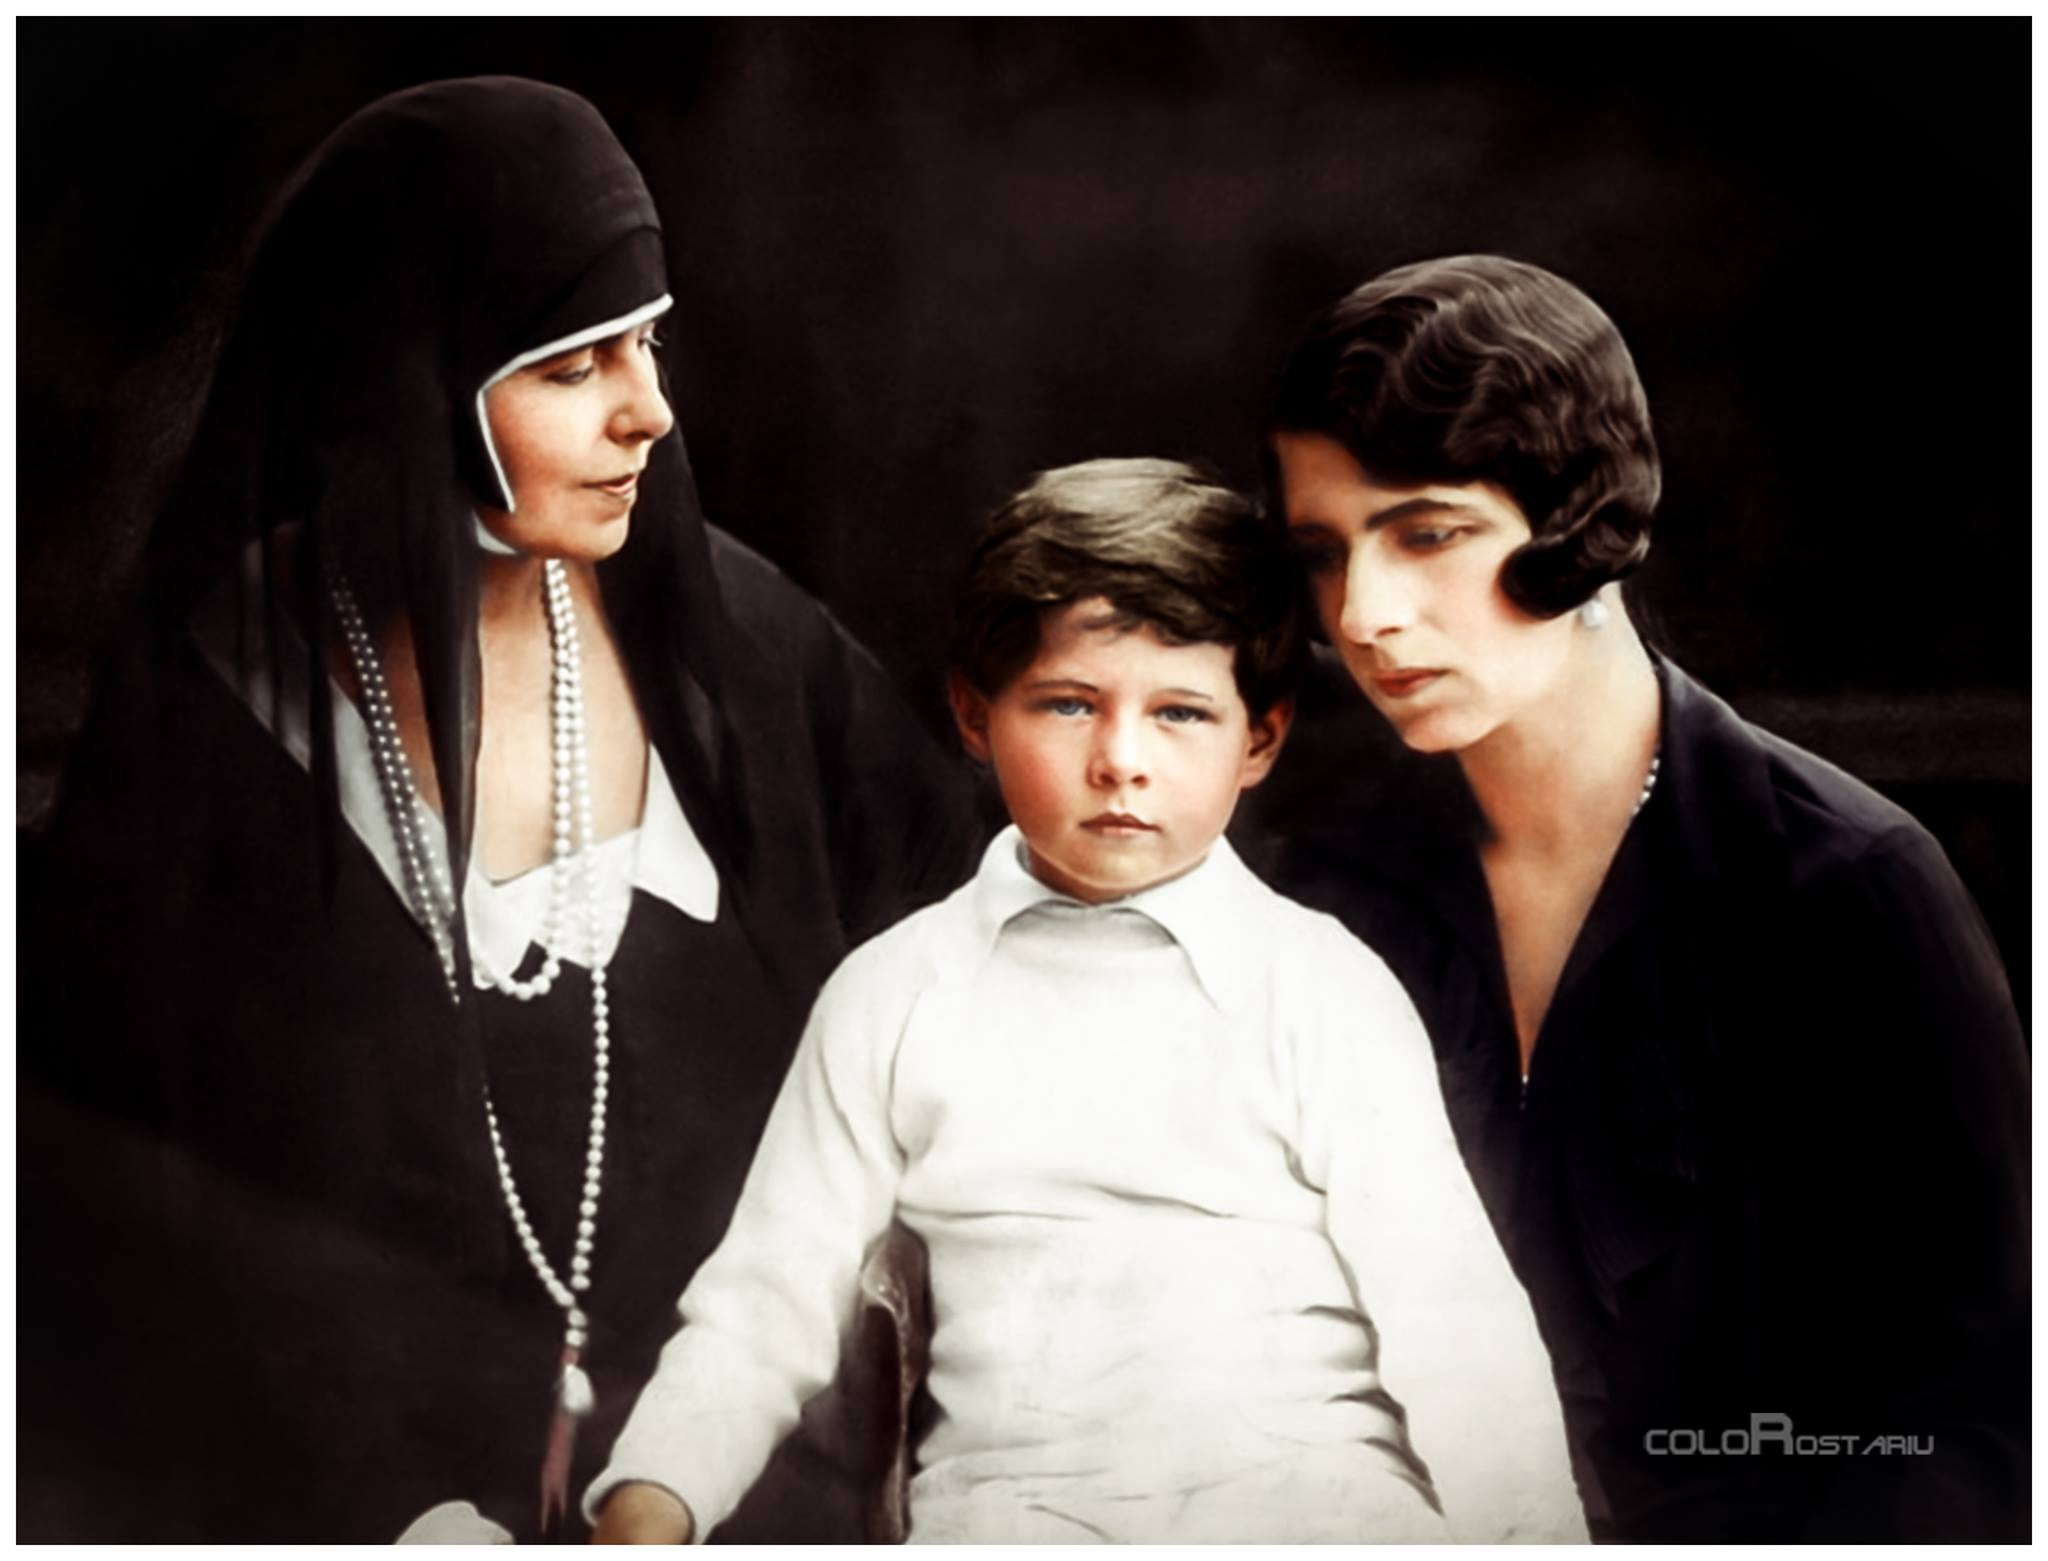 regele-mihai-al-romaniei-regina-elena-queen-mother-of-romania-princess-of-greece-and-denmark-queen-maria-the-king.jpg